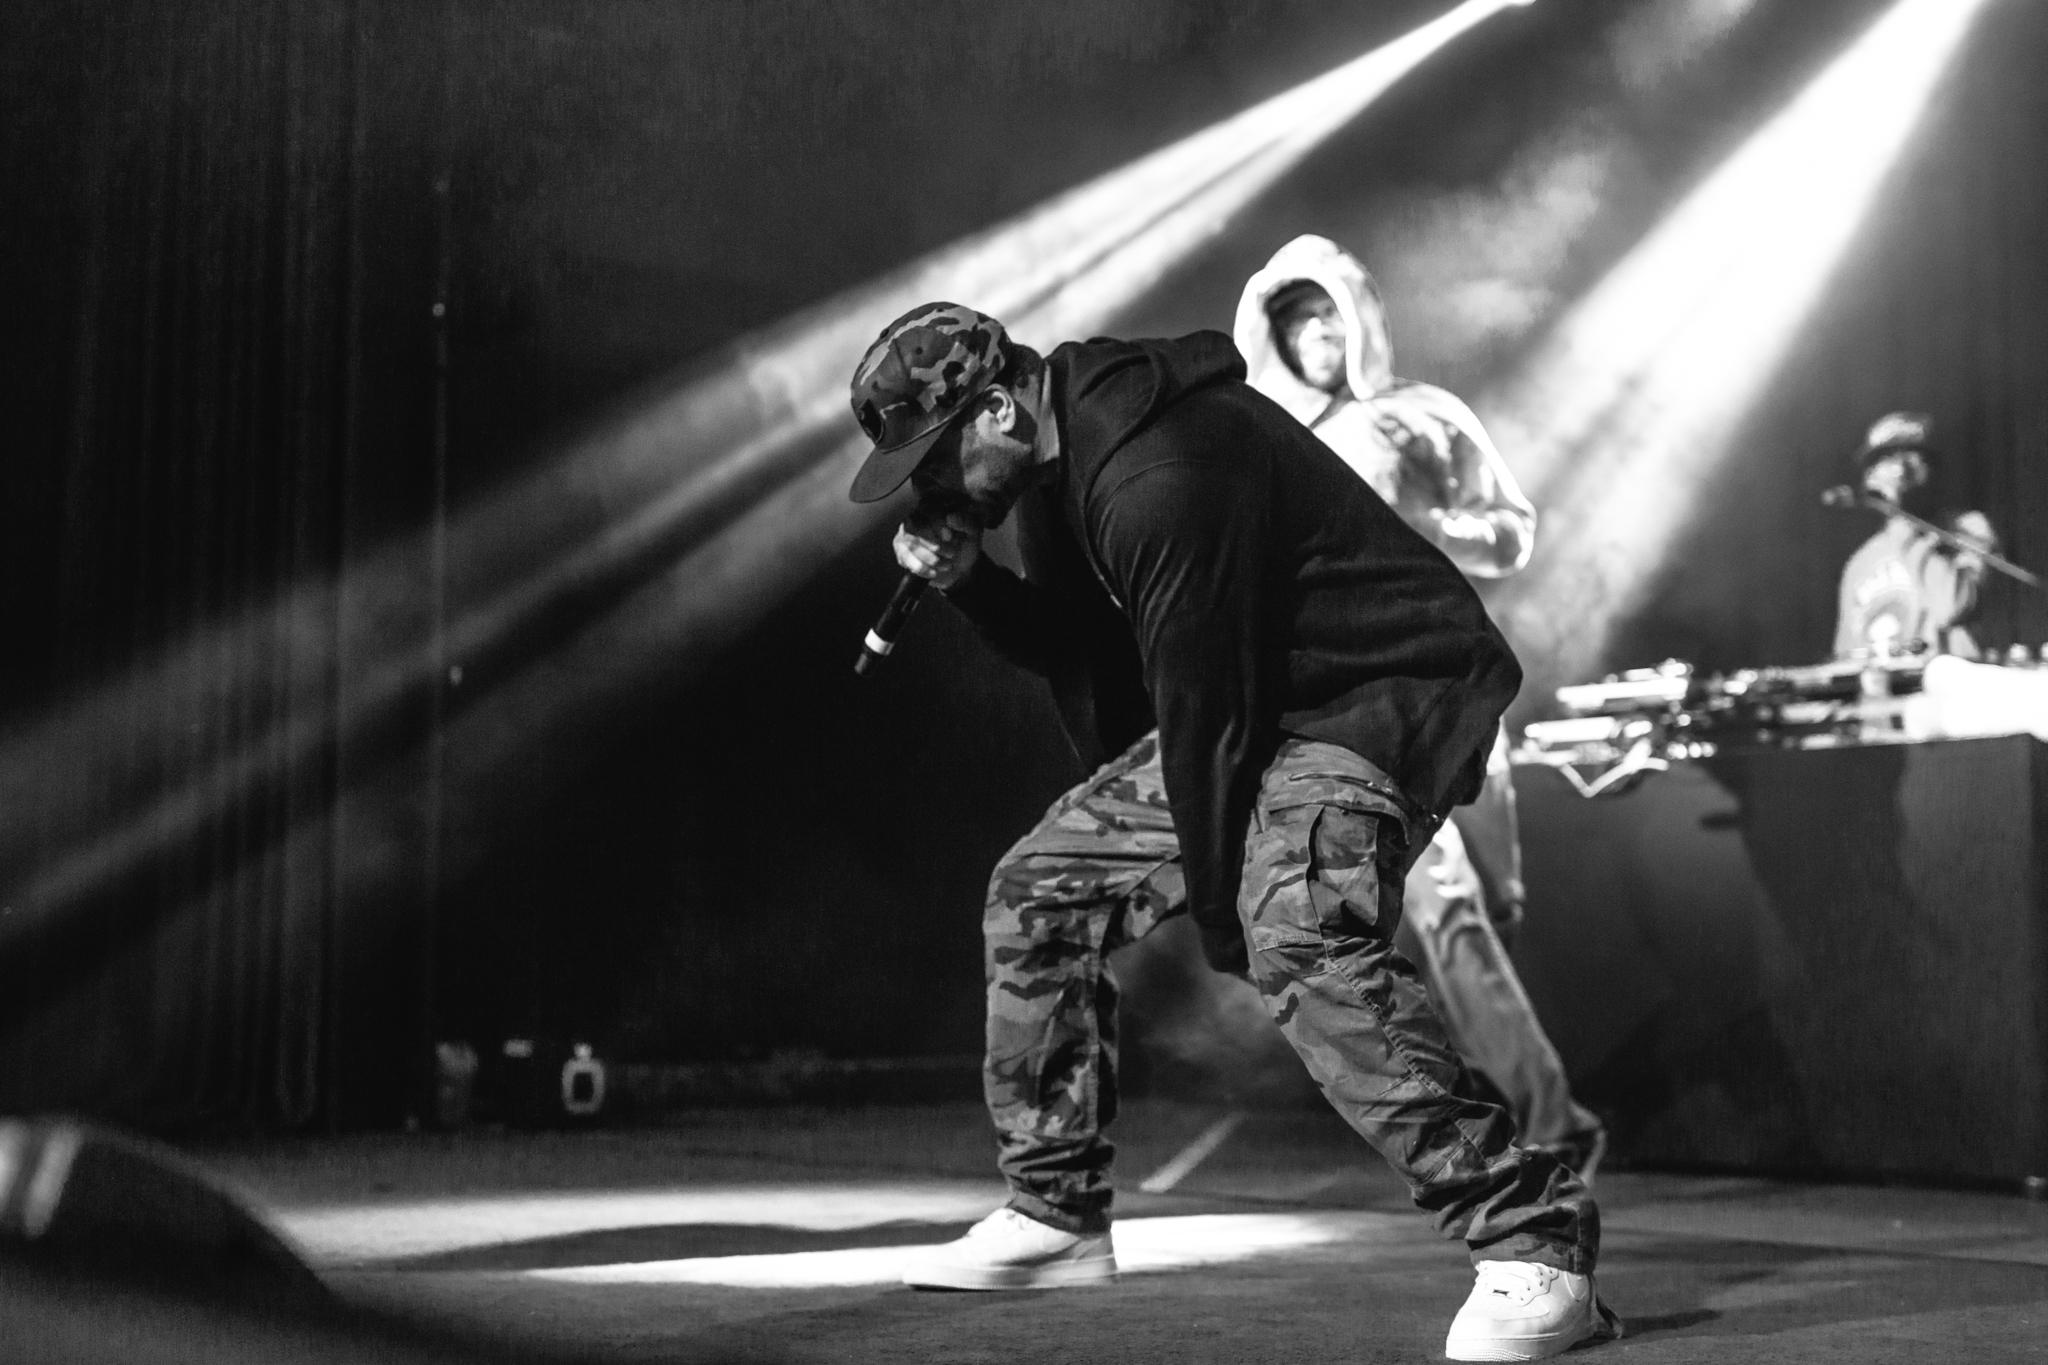 Mitch Lowe Photo - Methodman & Redman-38.jpg